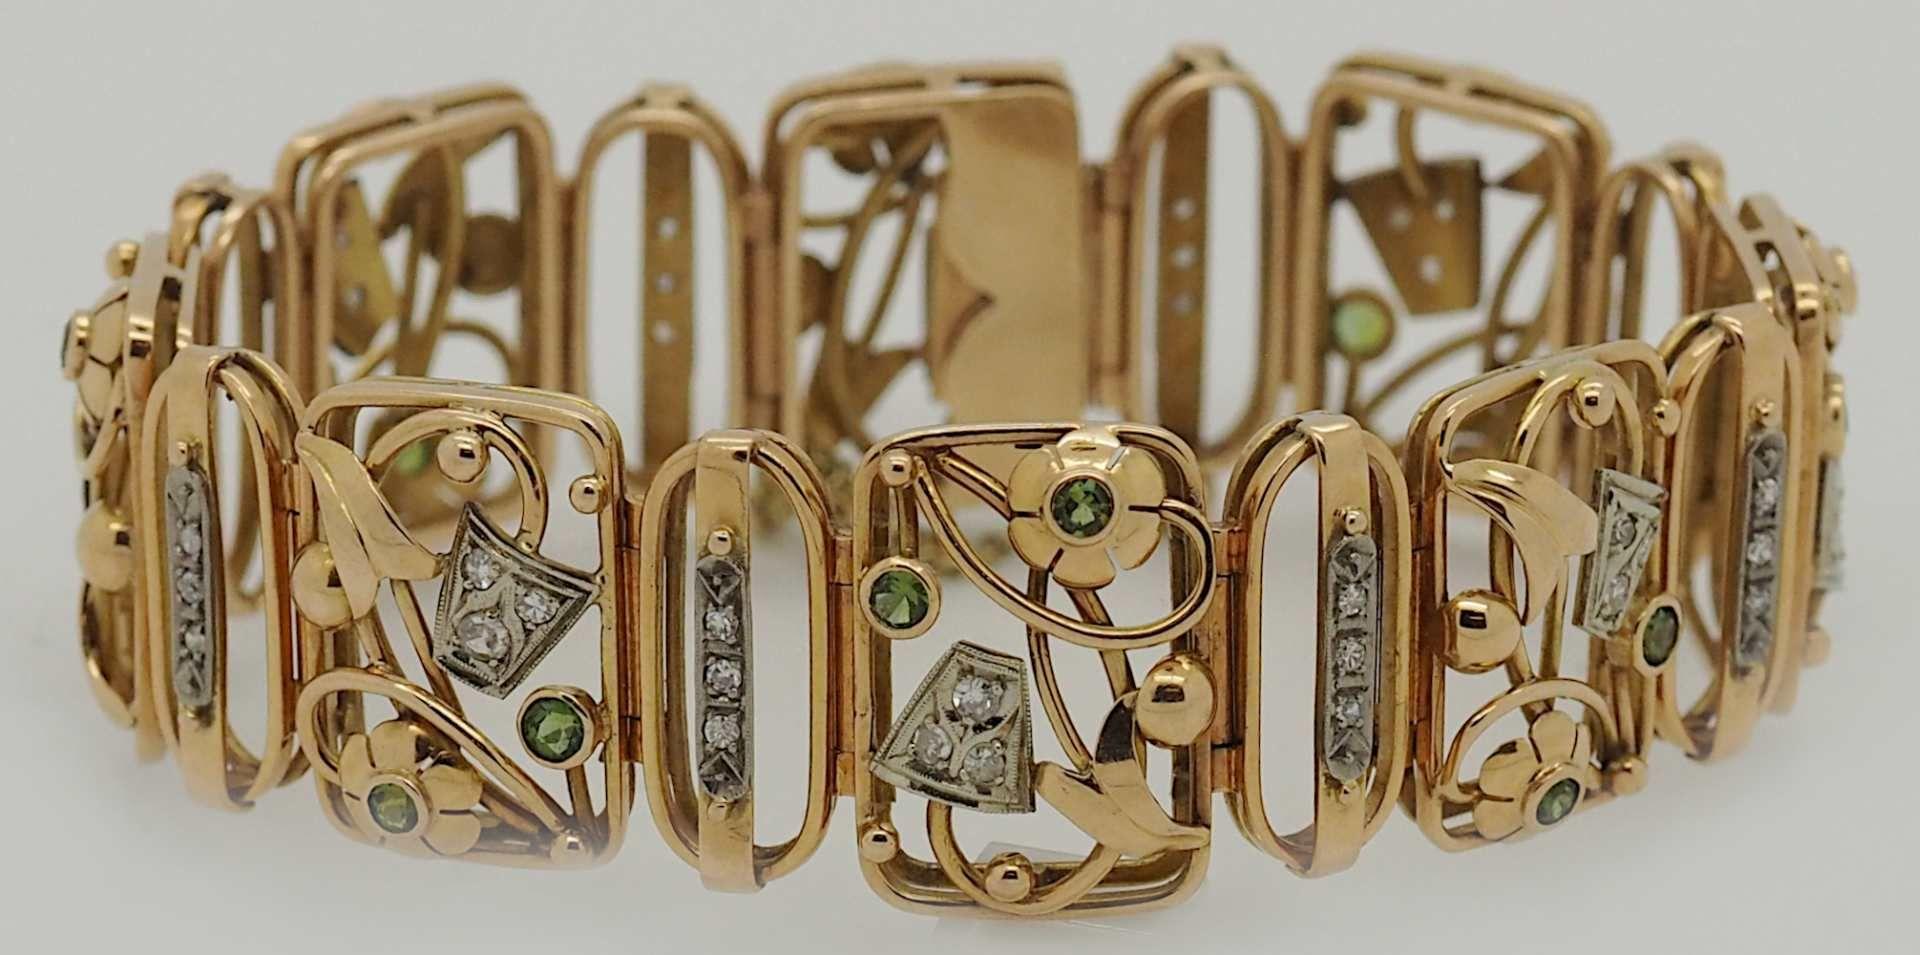 1 Damenarmband GG/WG 14ct. Brillanten, grüne Edelsteine (Peridot?)